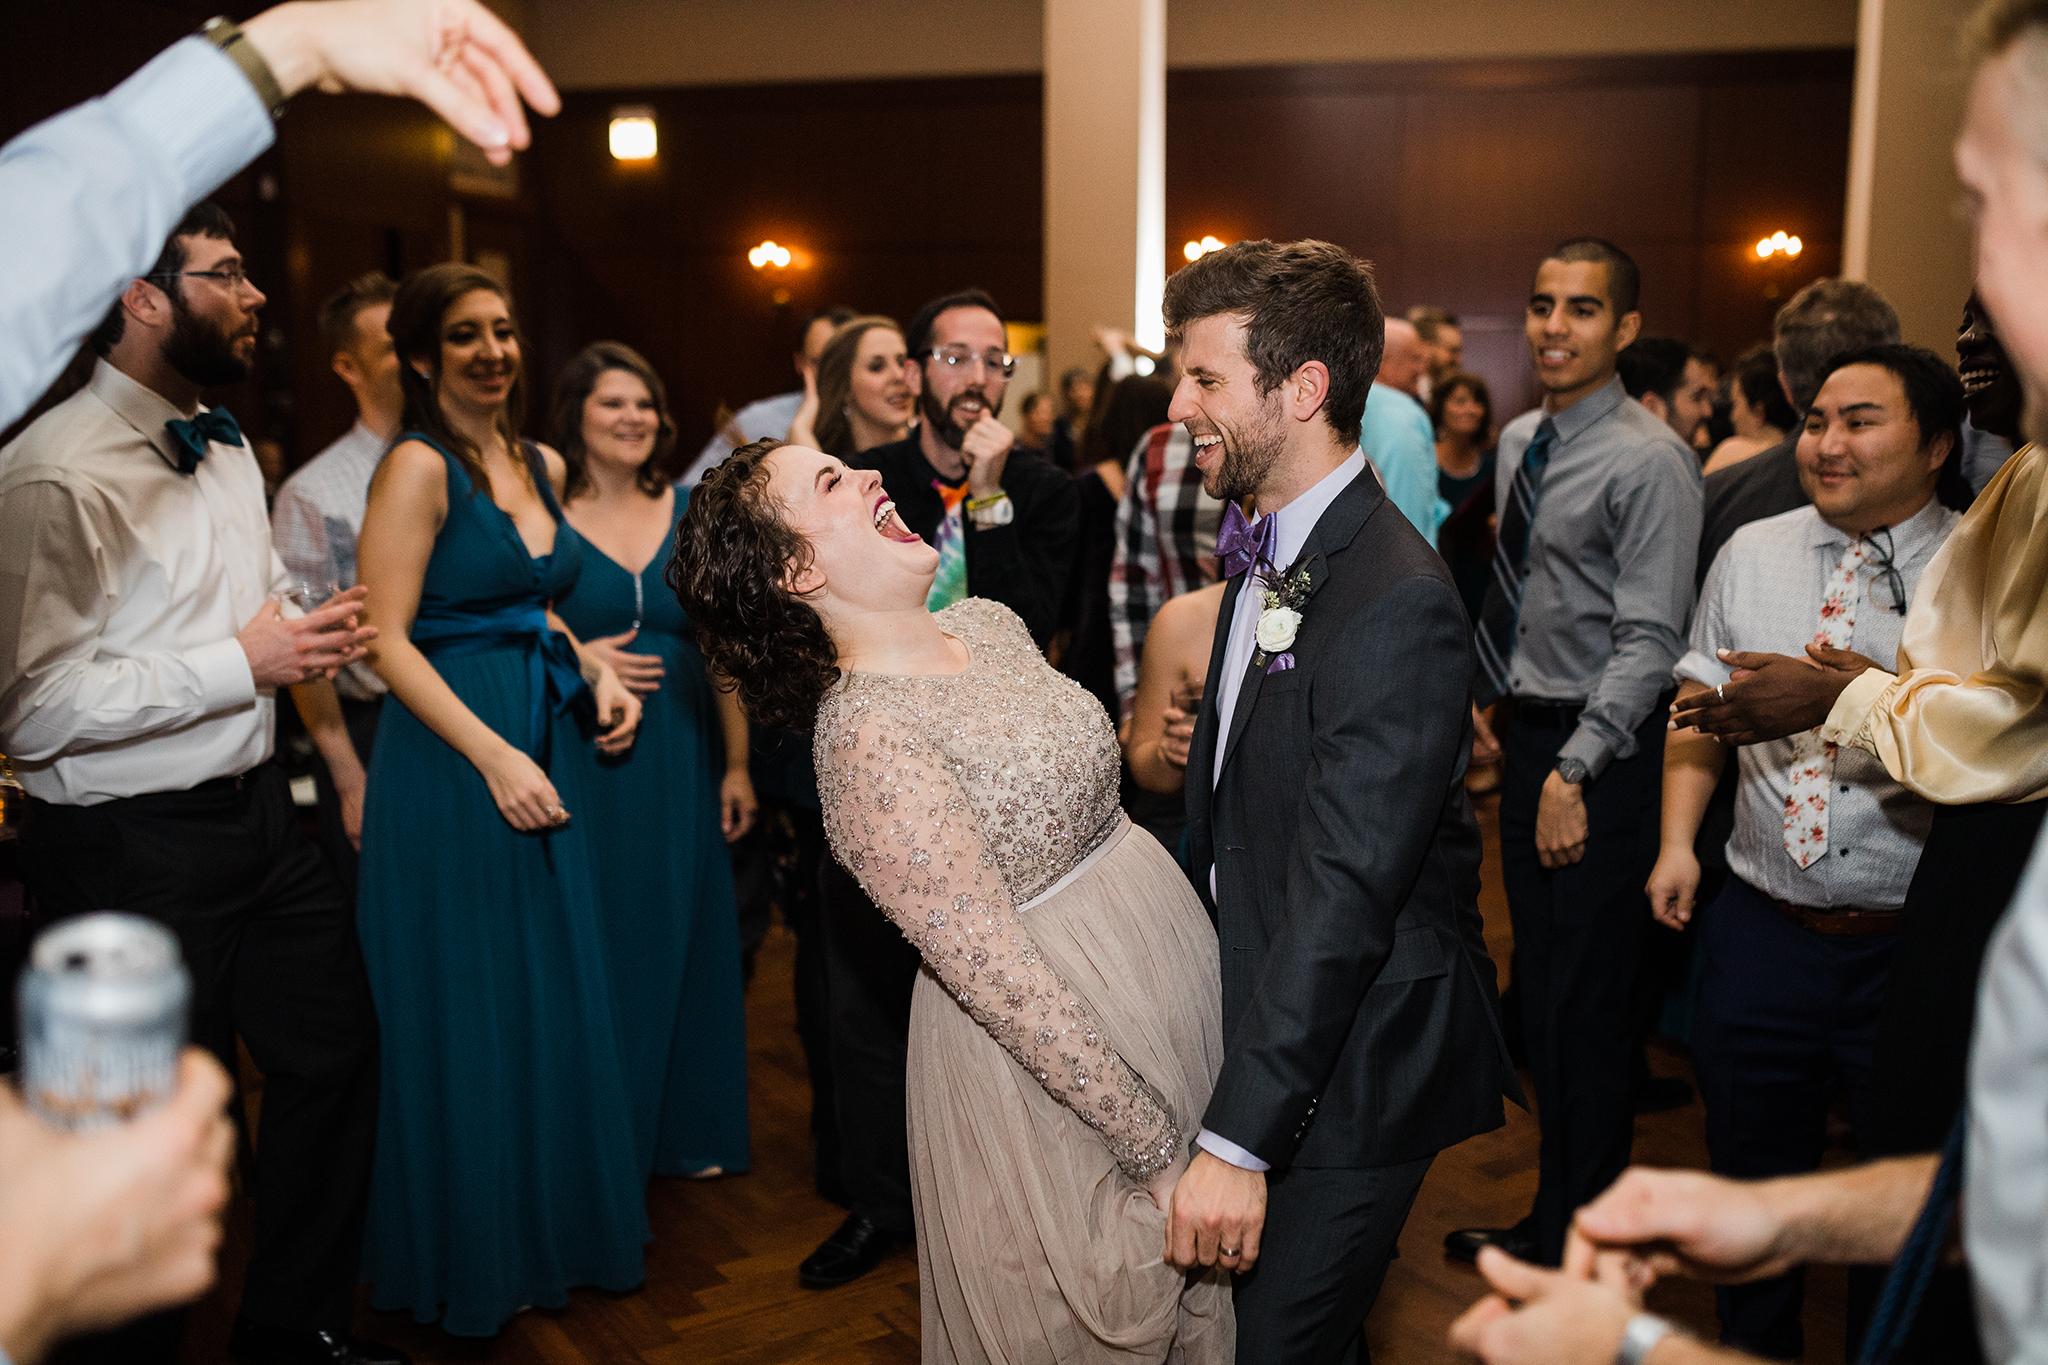 traverse_city_wedding_photographer_destination_reception_chicago_rockhill1.jpg